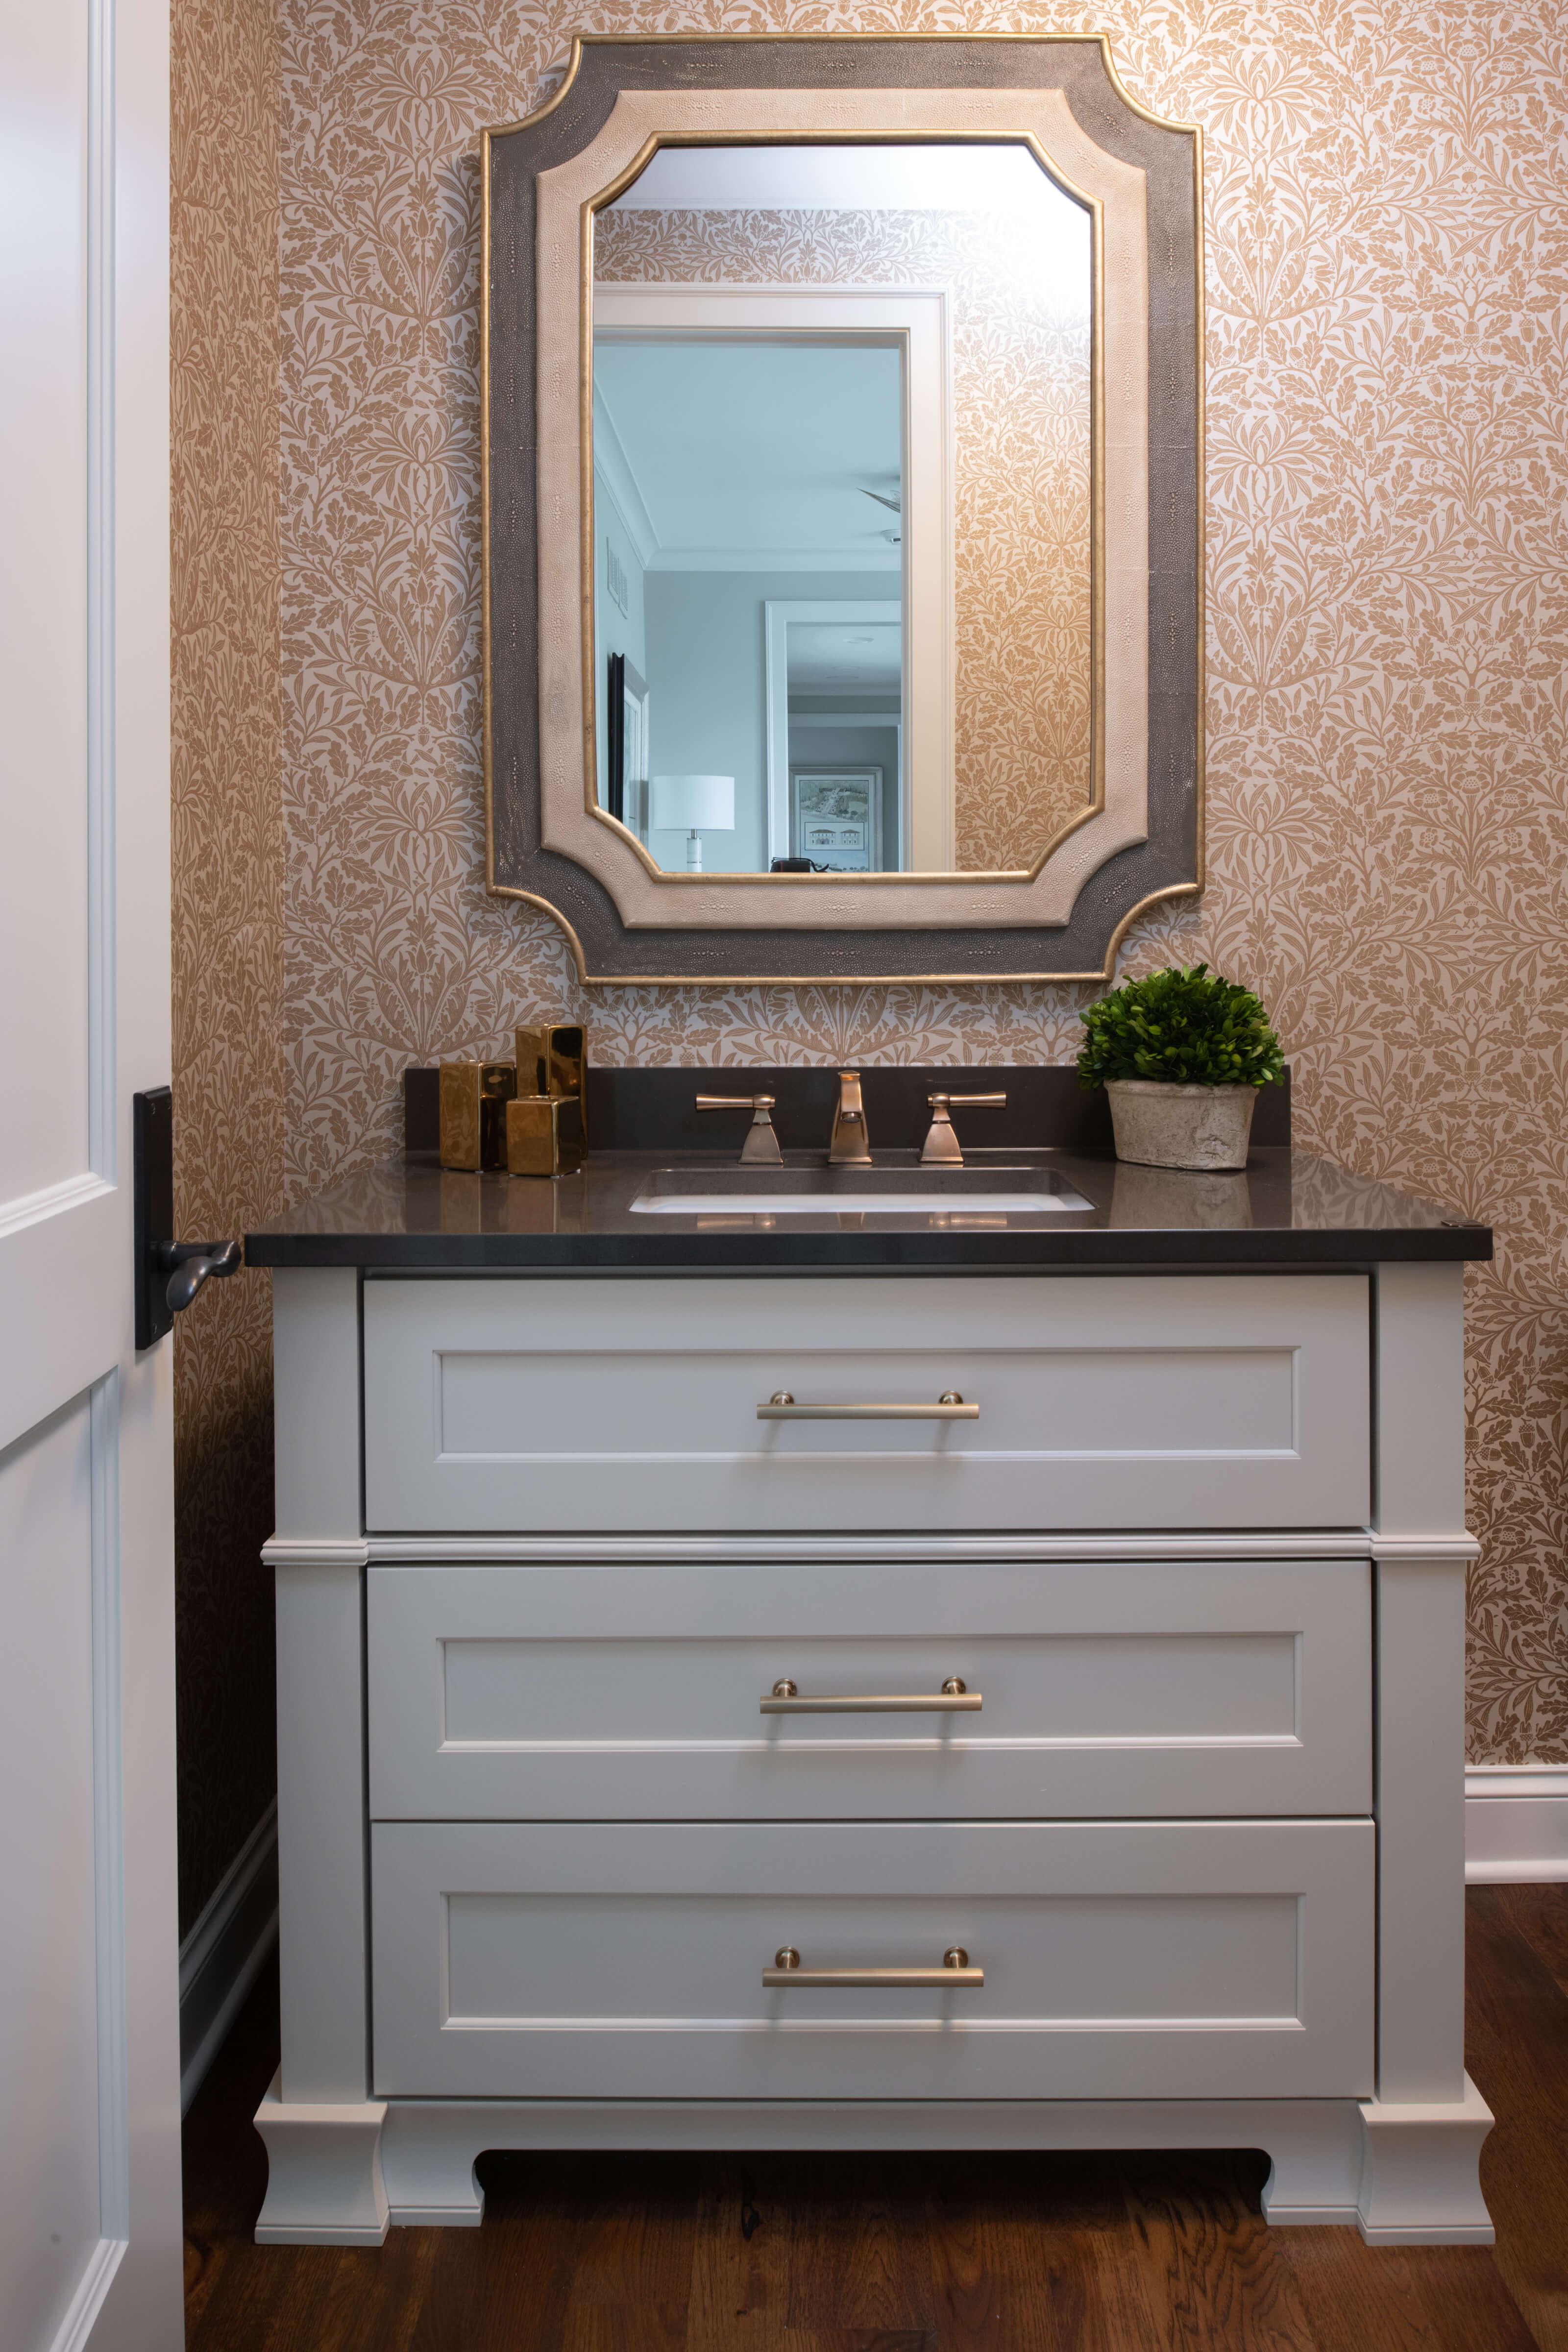 Dura Supreme Furniture Vanity, Designer Tricia Tidemann at Mingle Design Studio